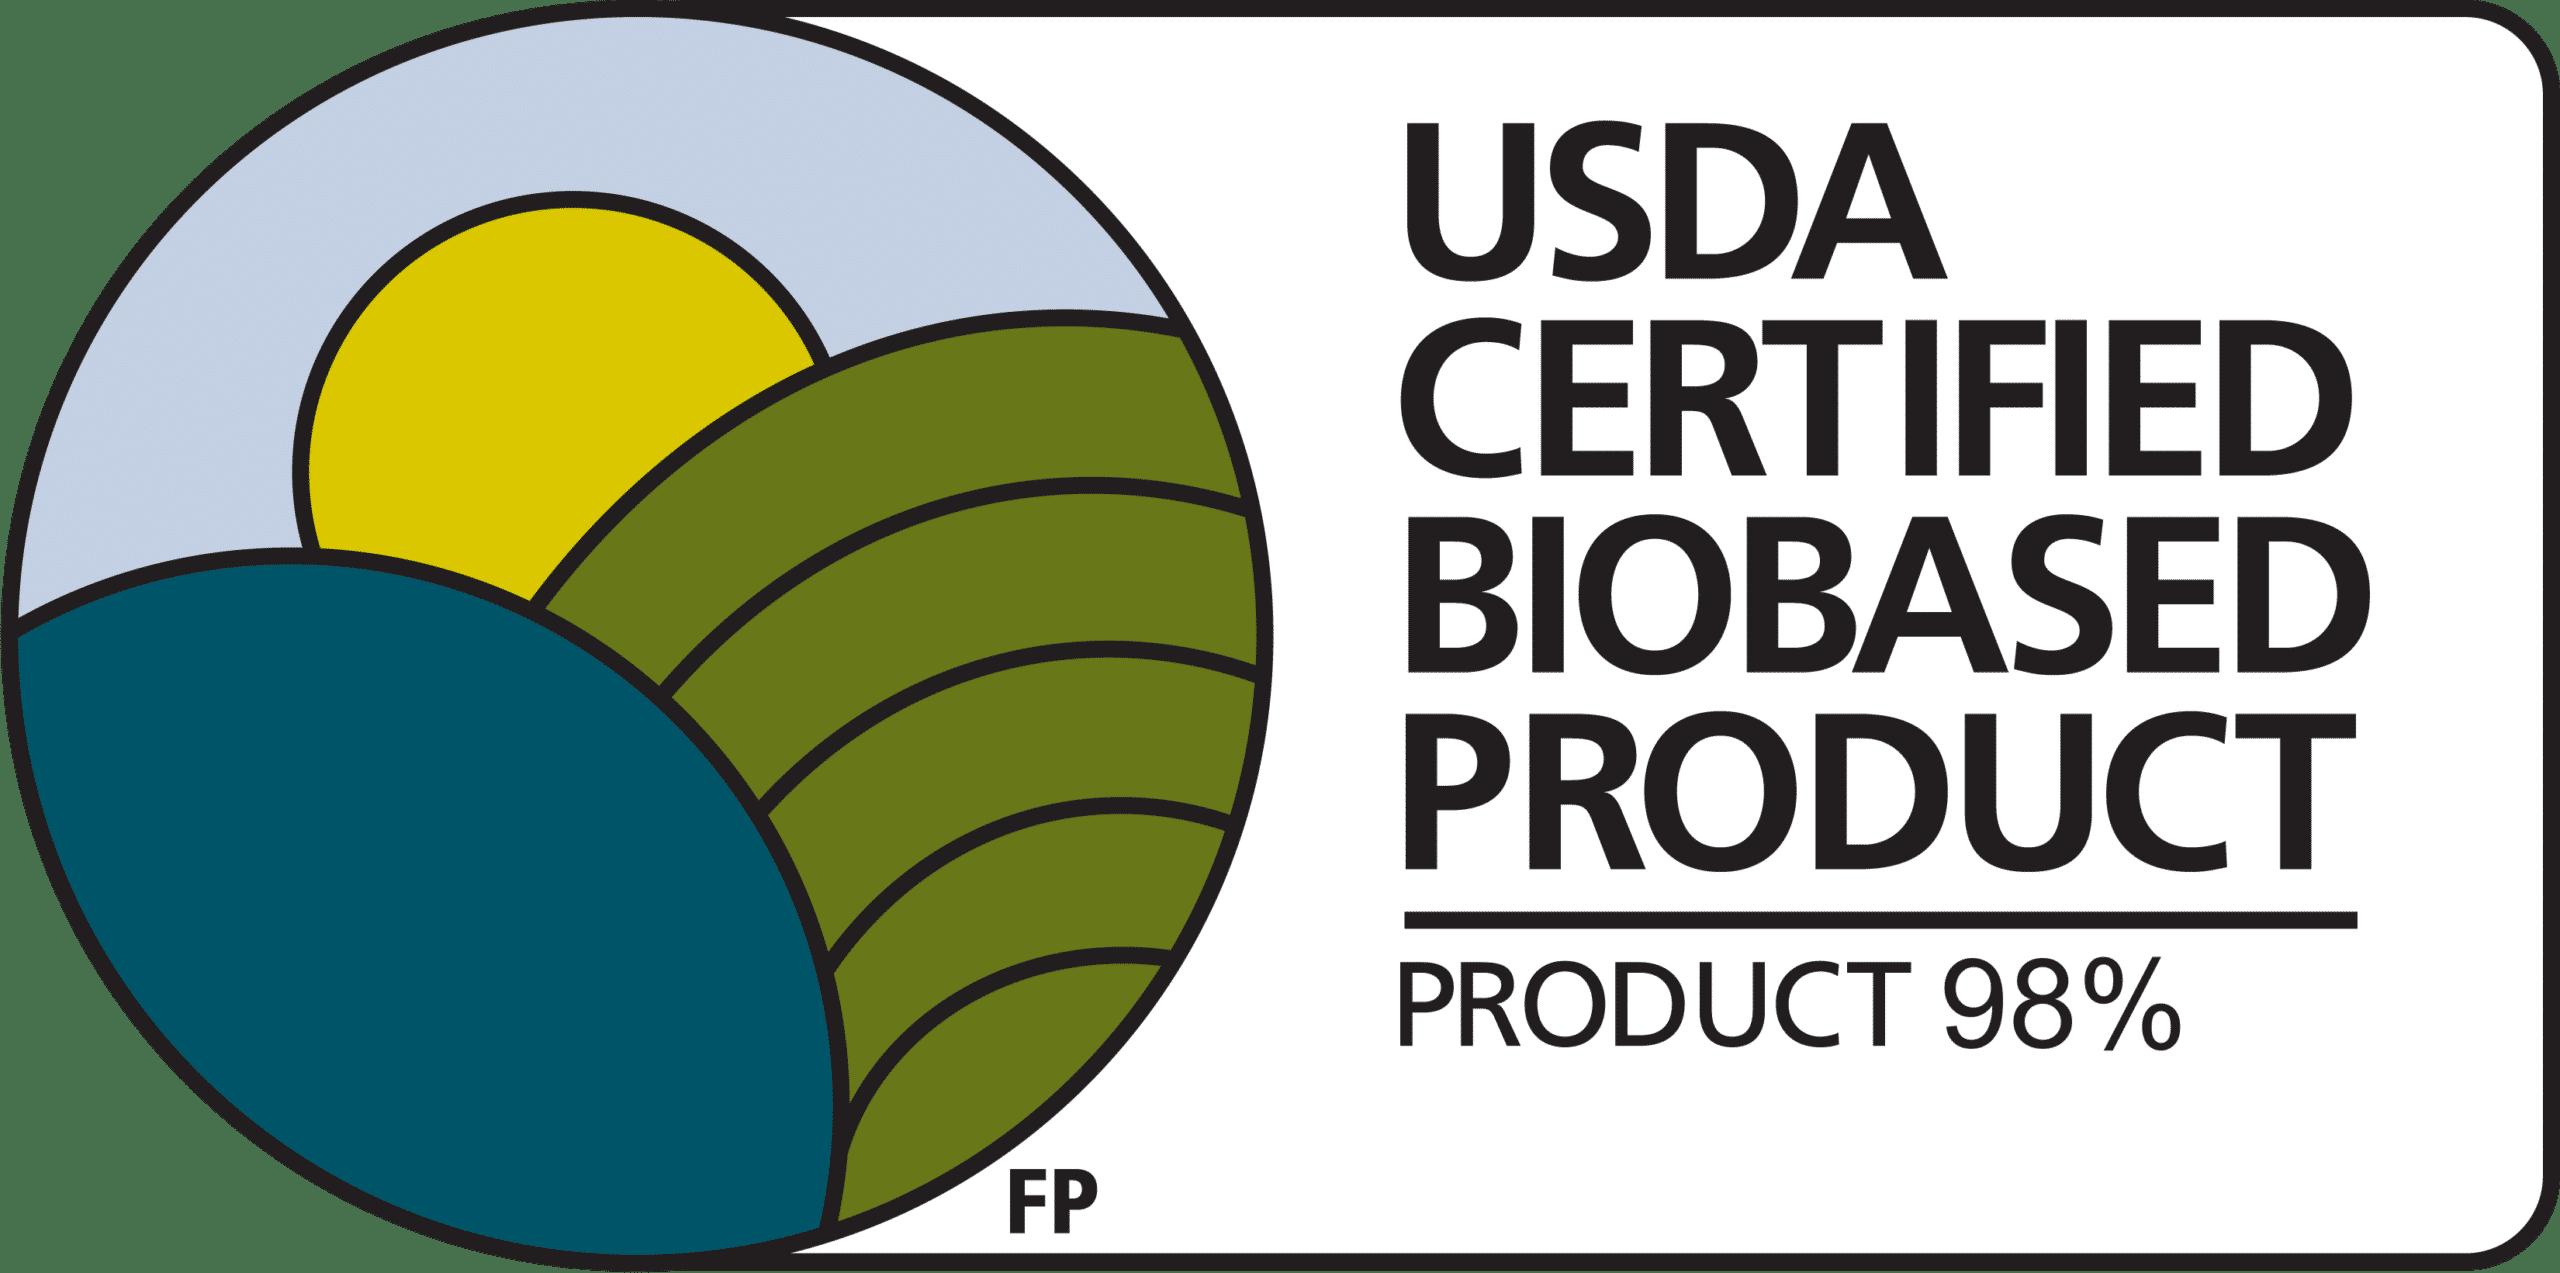 BioPreferredLabel-FC&Rodent